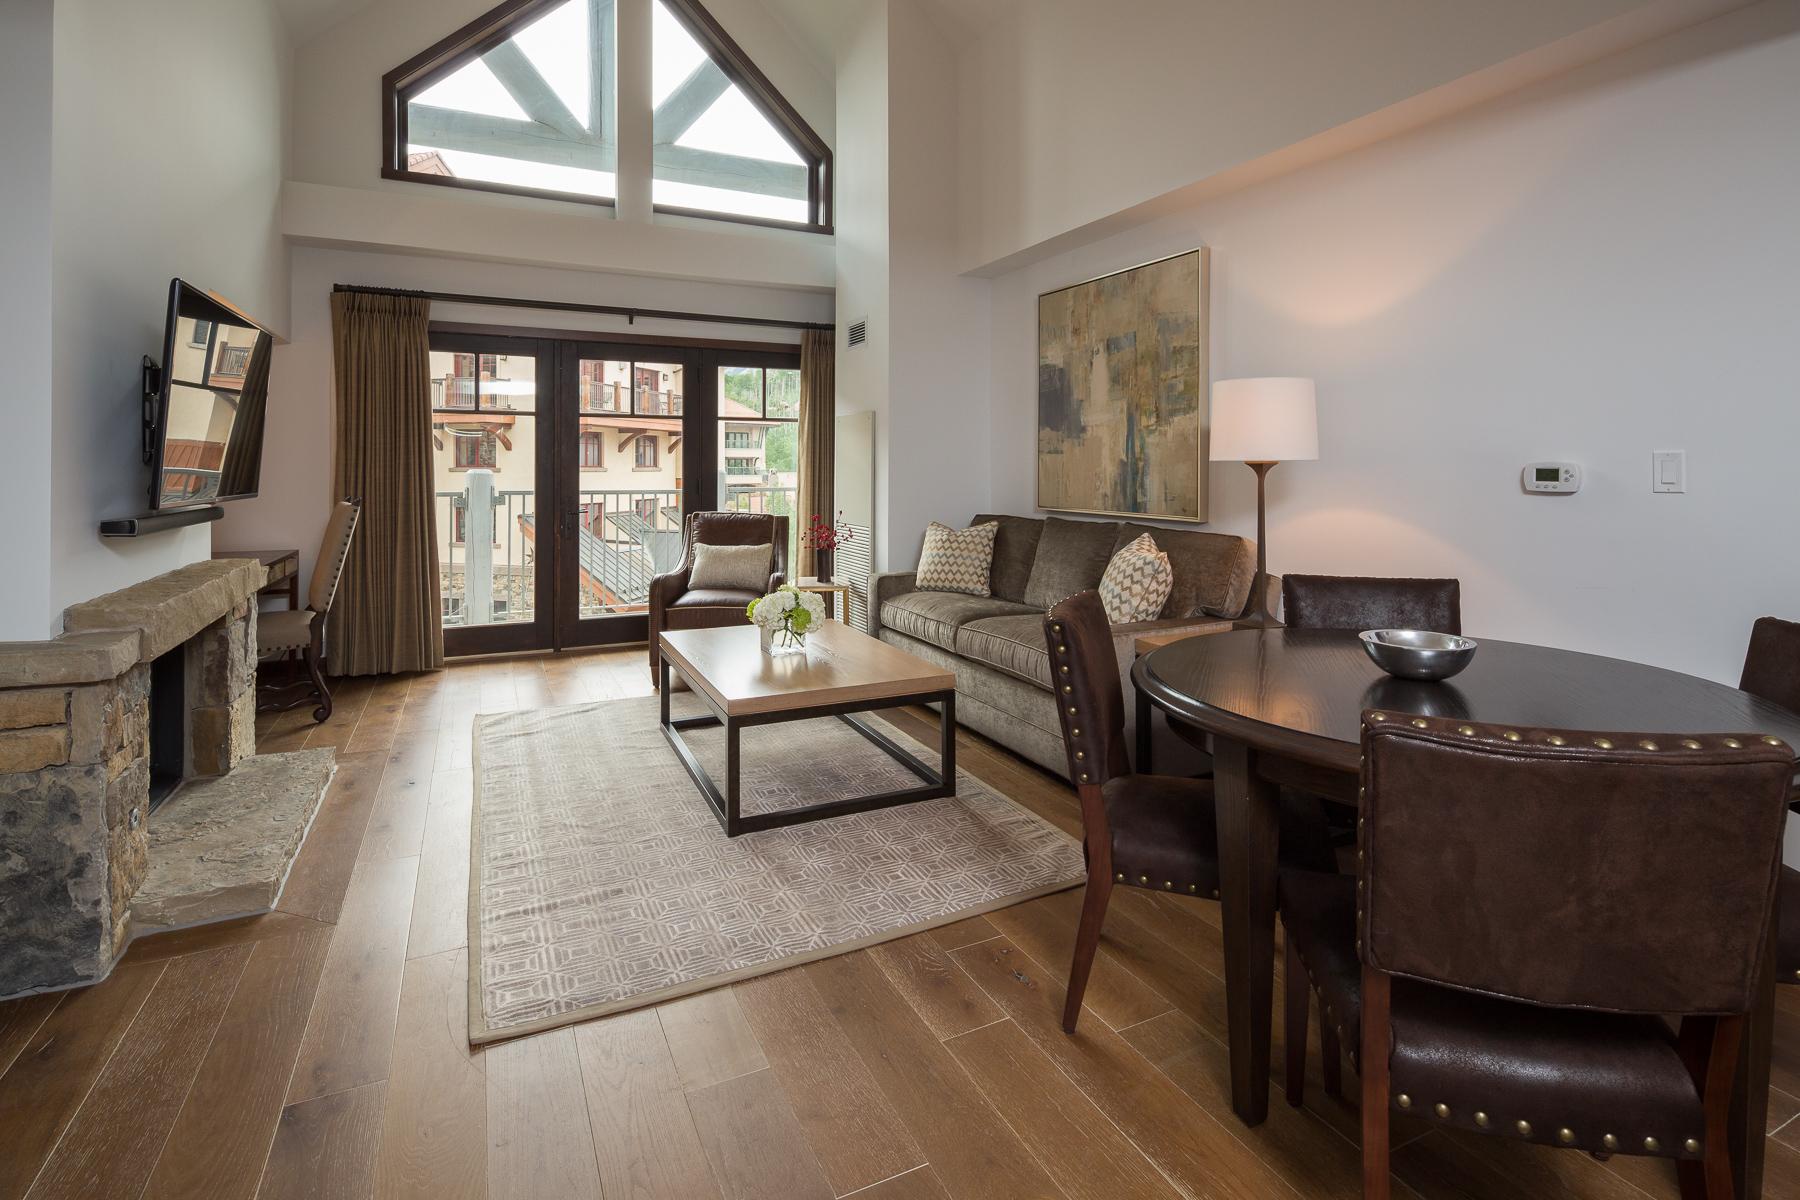 Nhà chung cư vì Bán tại Residence 1404, Madeline Hotel & Residences 568 Mountain Village Boulevard, Residence 1404 Telluride, Colorado, 81435 Hoa Kỳ